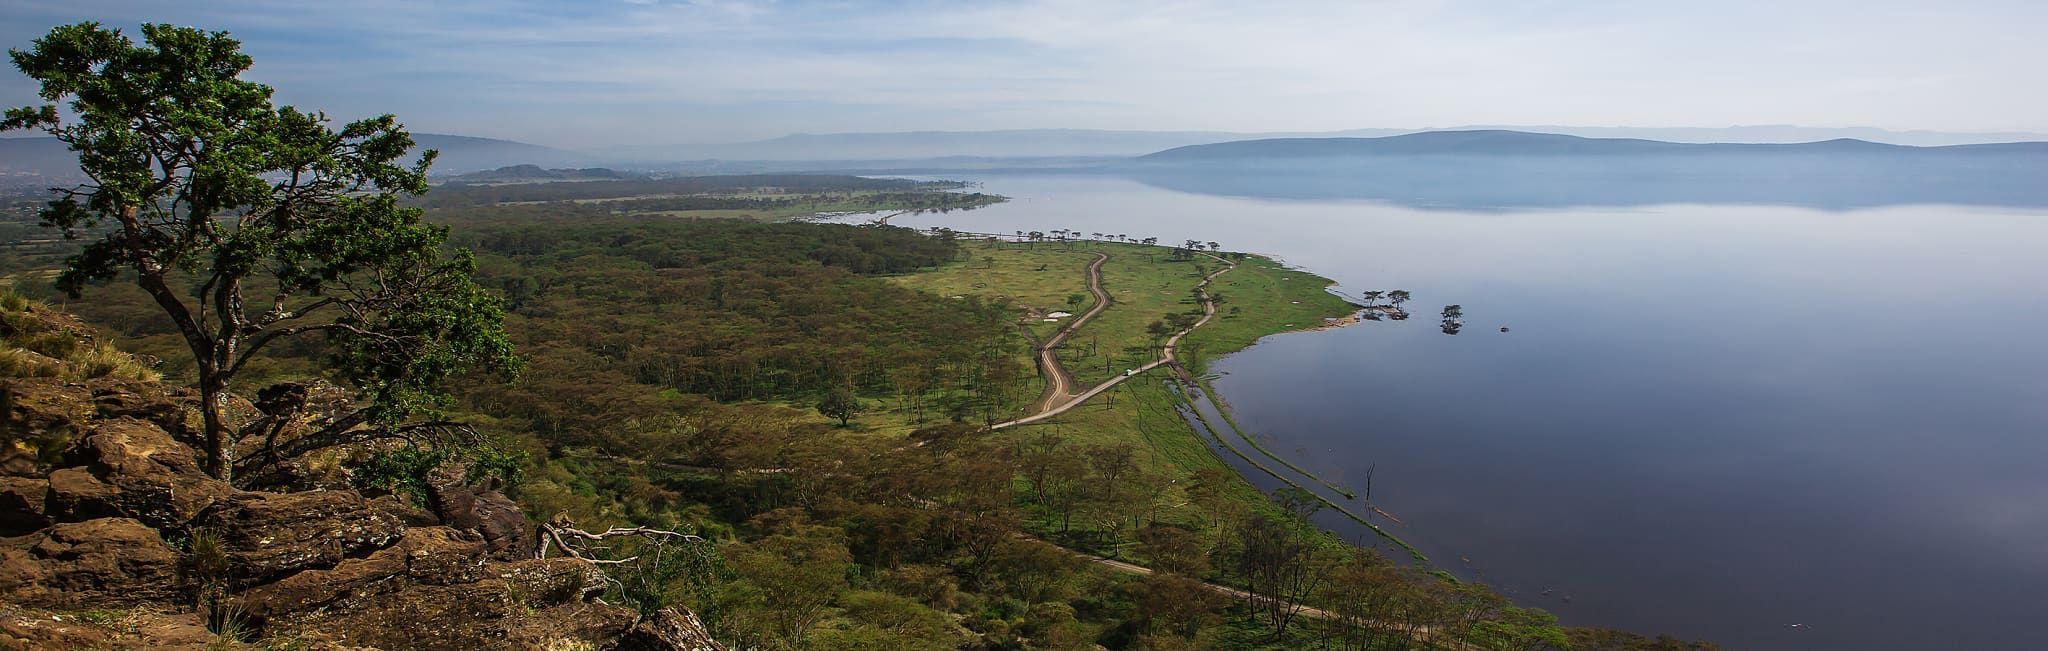 Aerial view over Lake Nakuru in Kenya